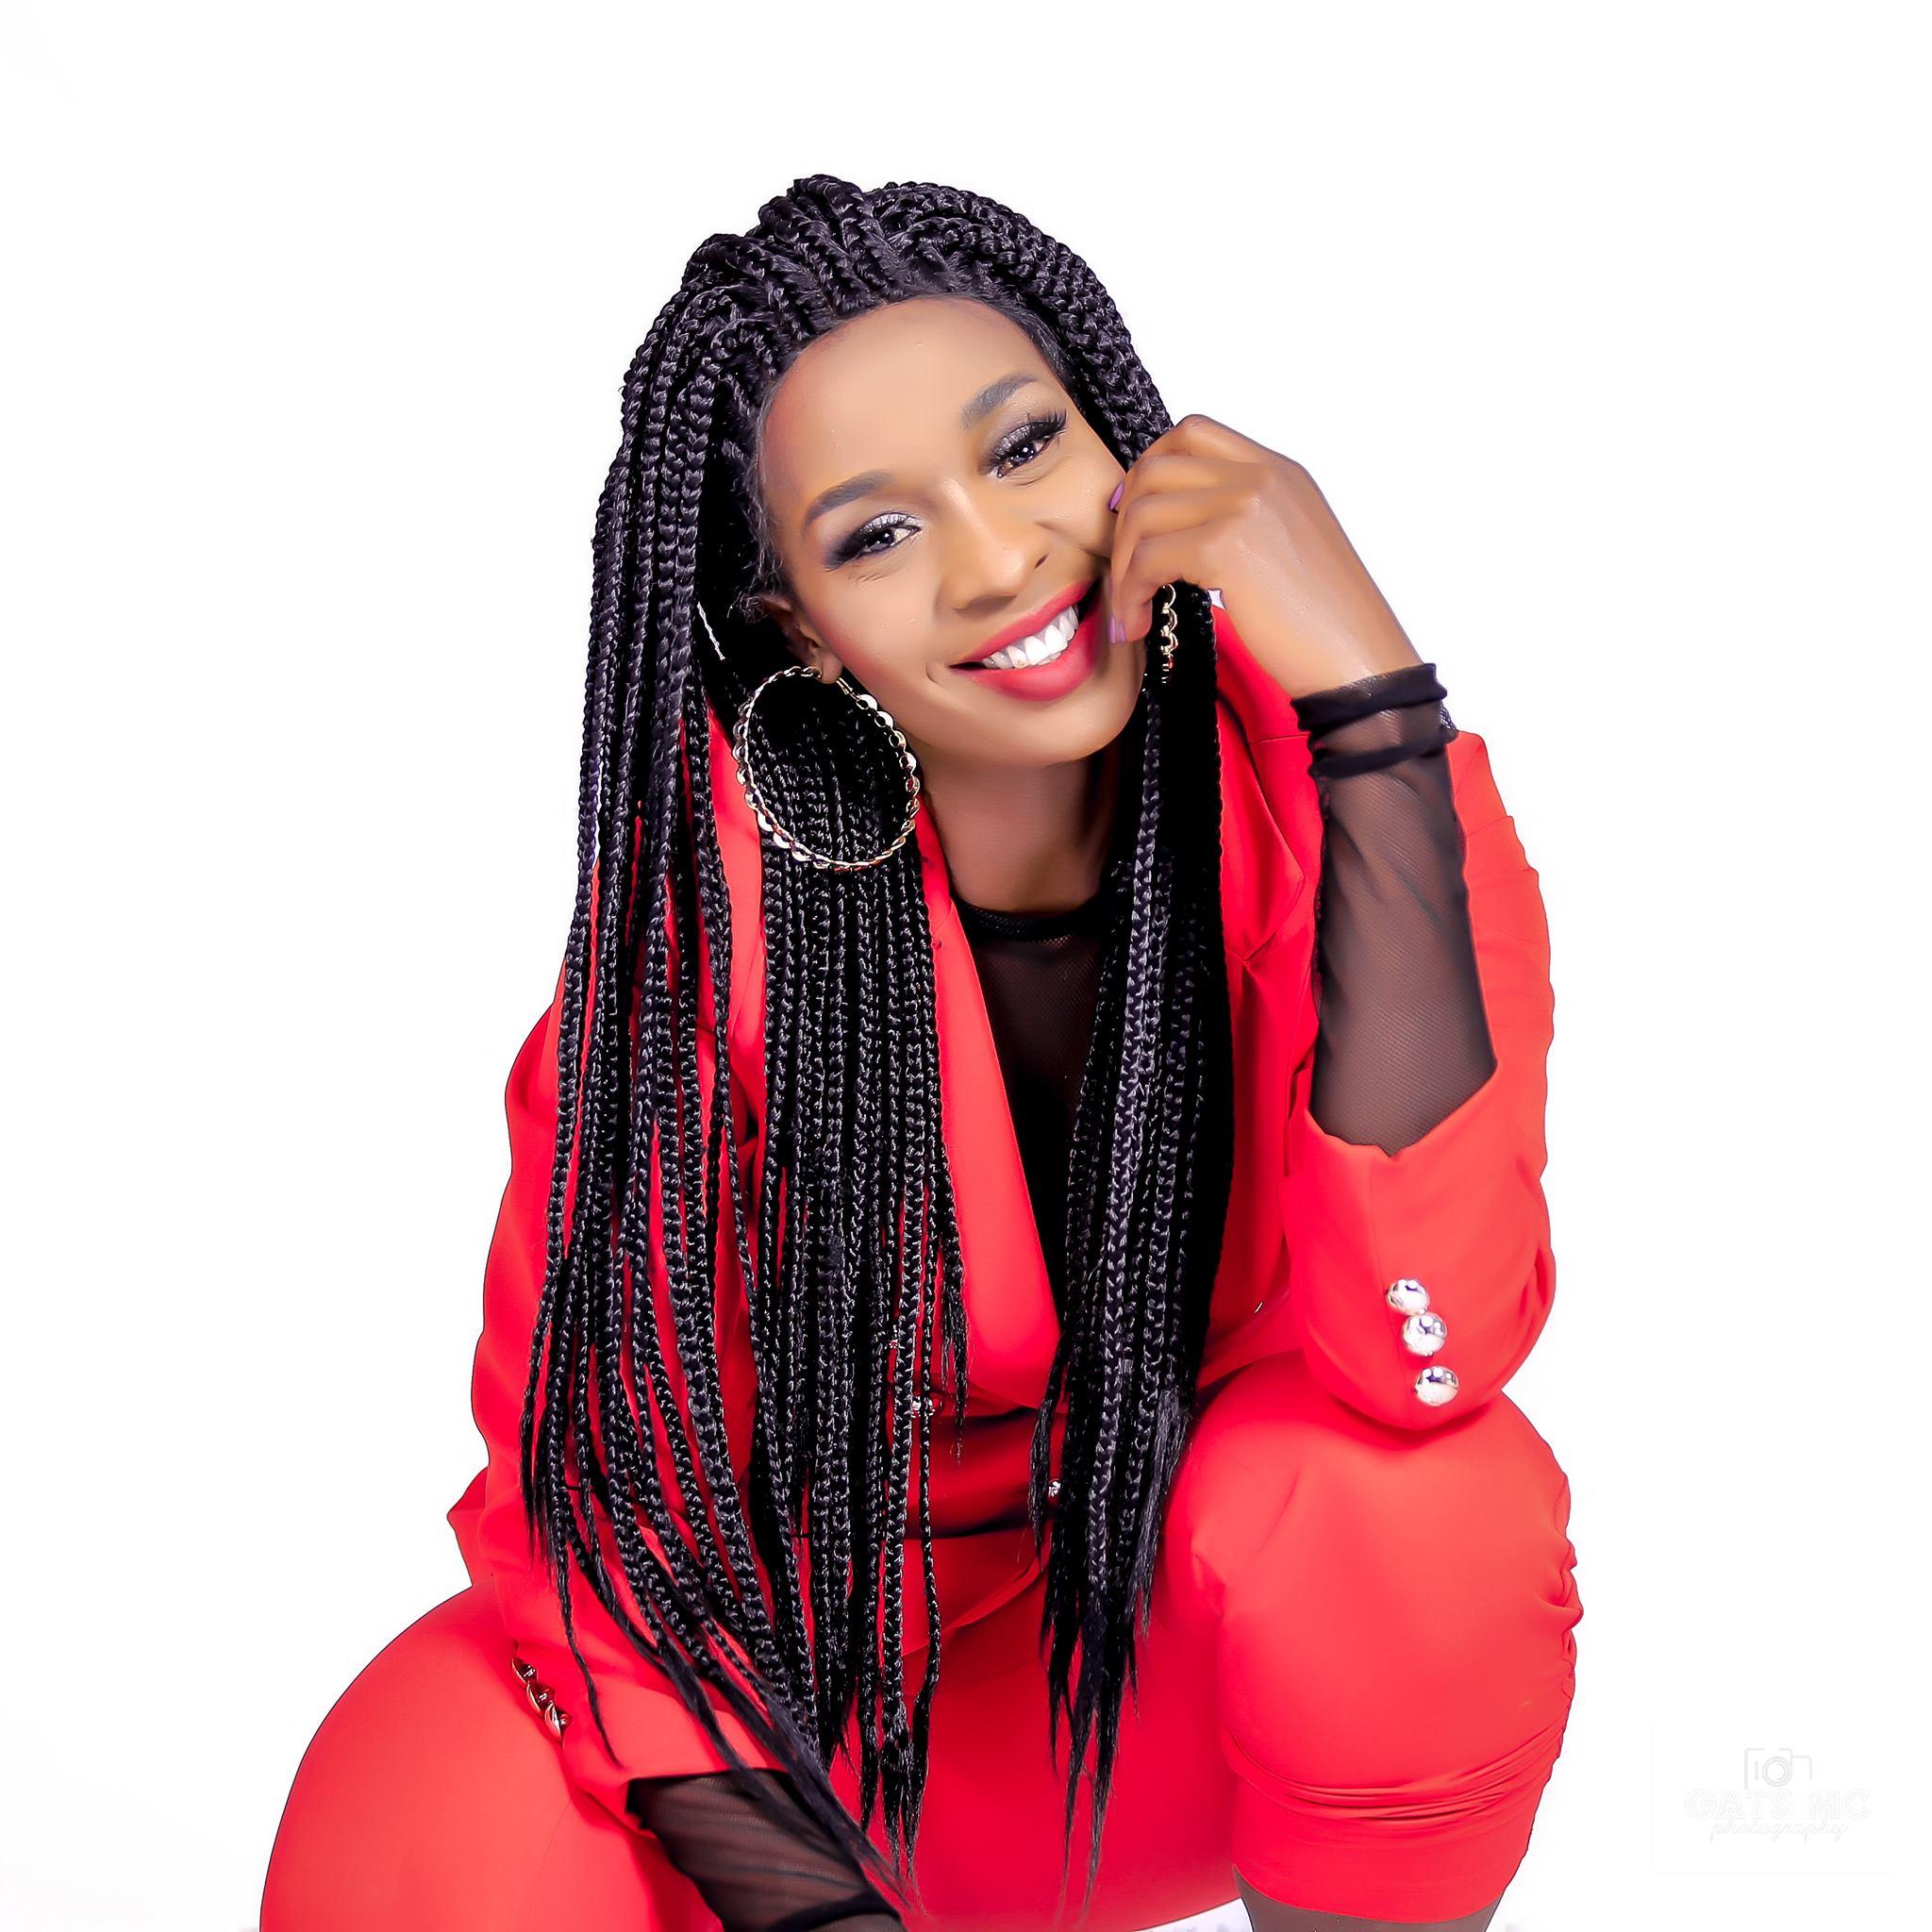 Ugandan musician Cindy Sanyu [Facebook/Cindy Sanyu]